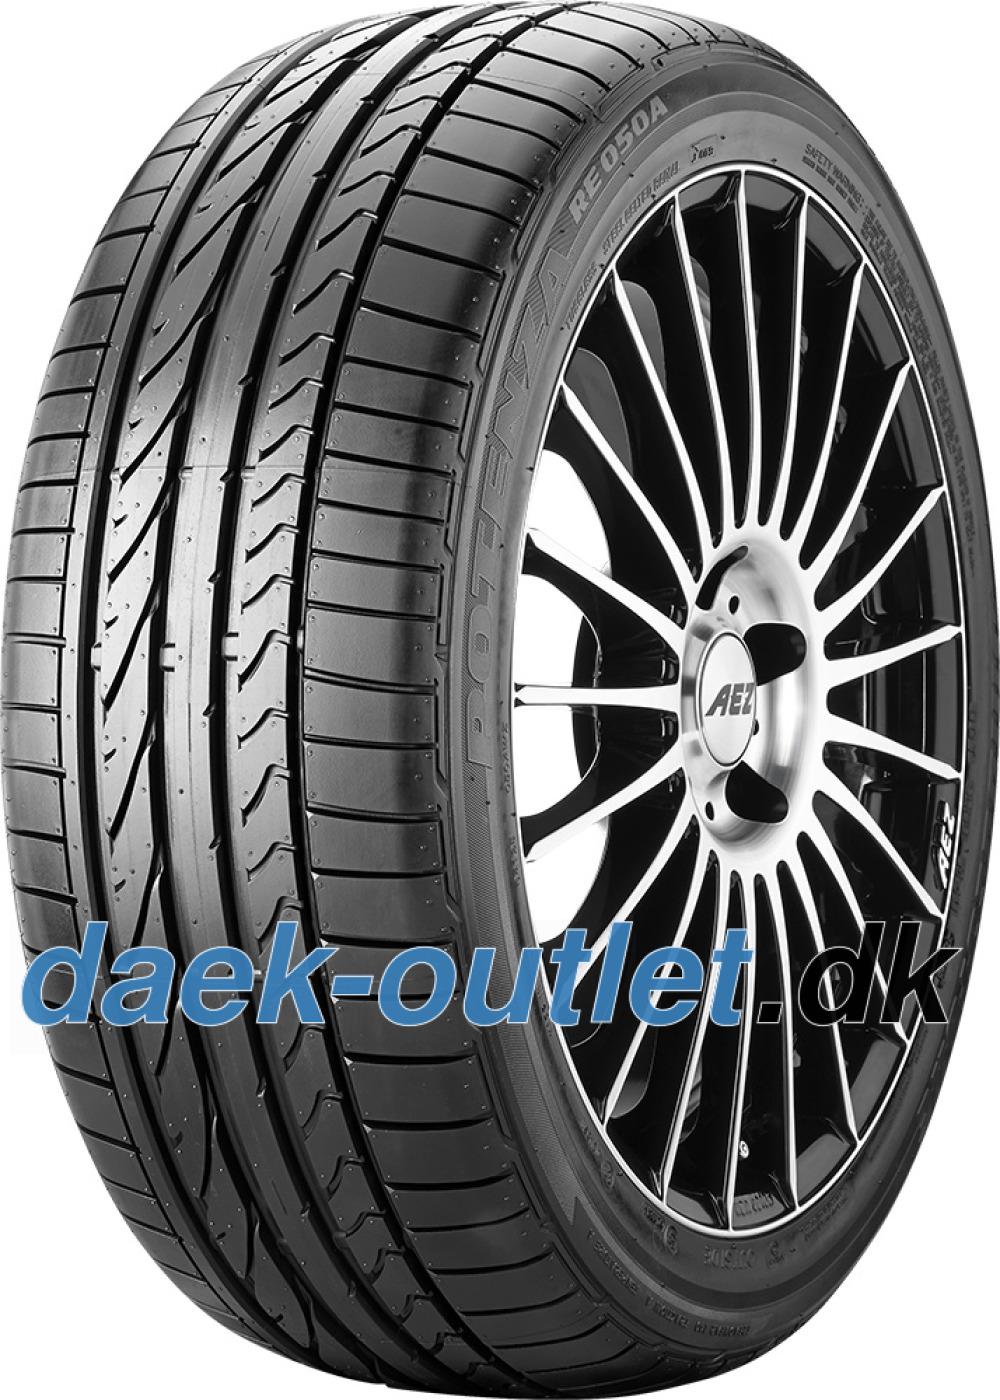 Bridgestone Potenza RE 050 A ( 225/45 R18 95W XL )